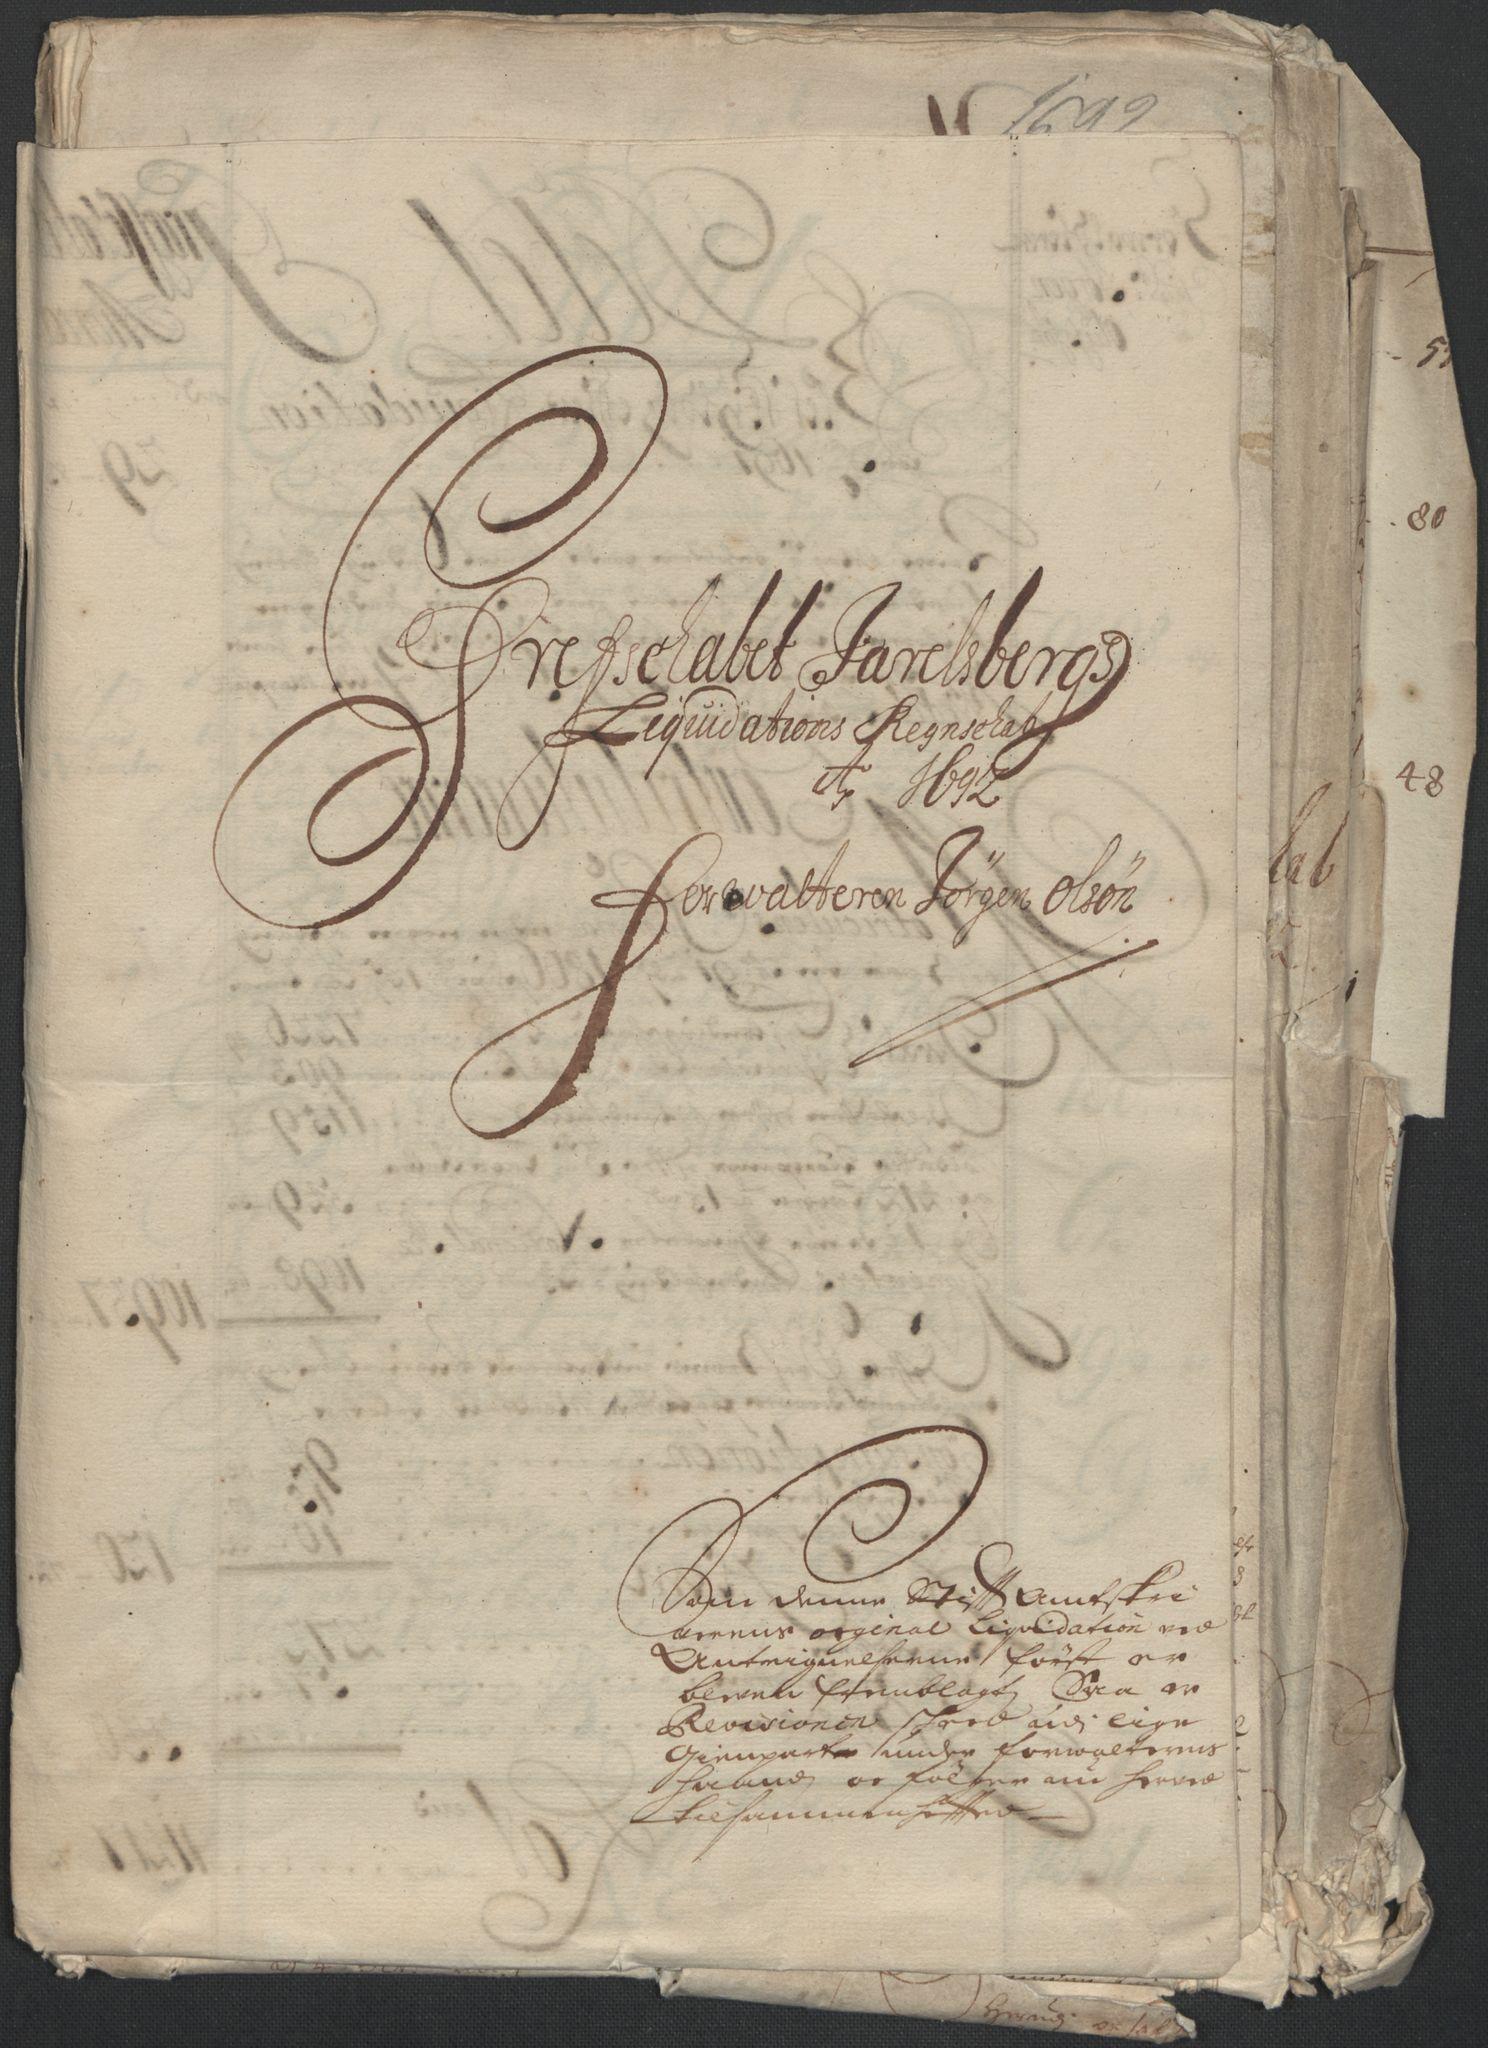 RA, Rentekammeret inntil 1814, Reviderte regnskaper, Fogderegnskap, R32/L1865: Fogderegnskap Jarlsberg grevskap, 1692, s. 13